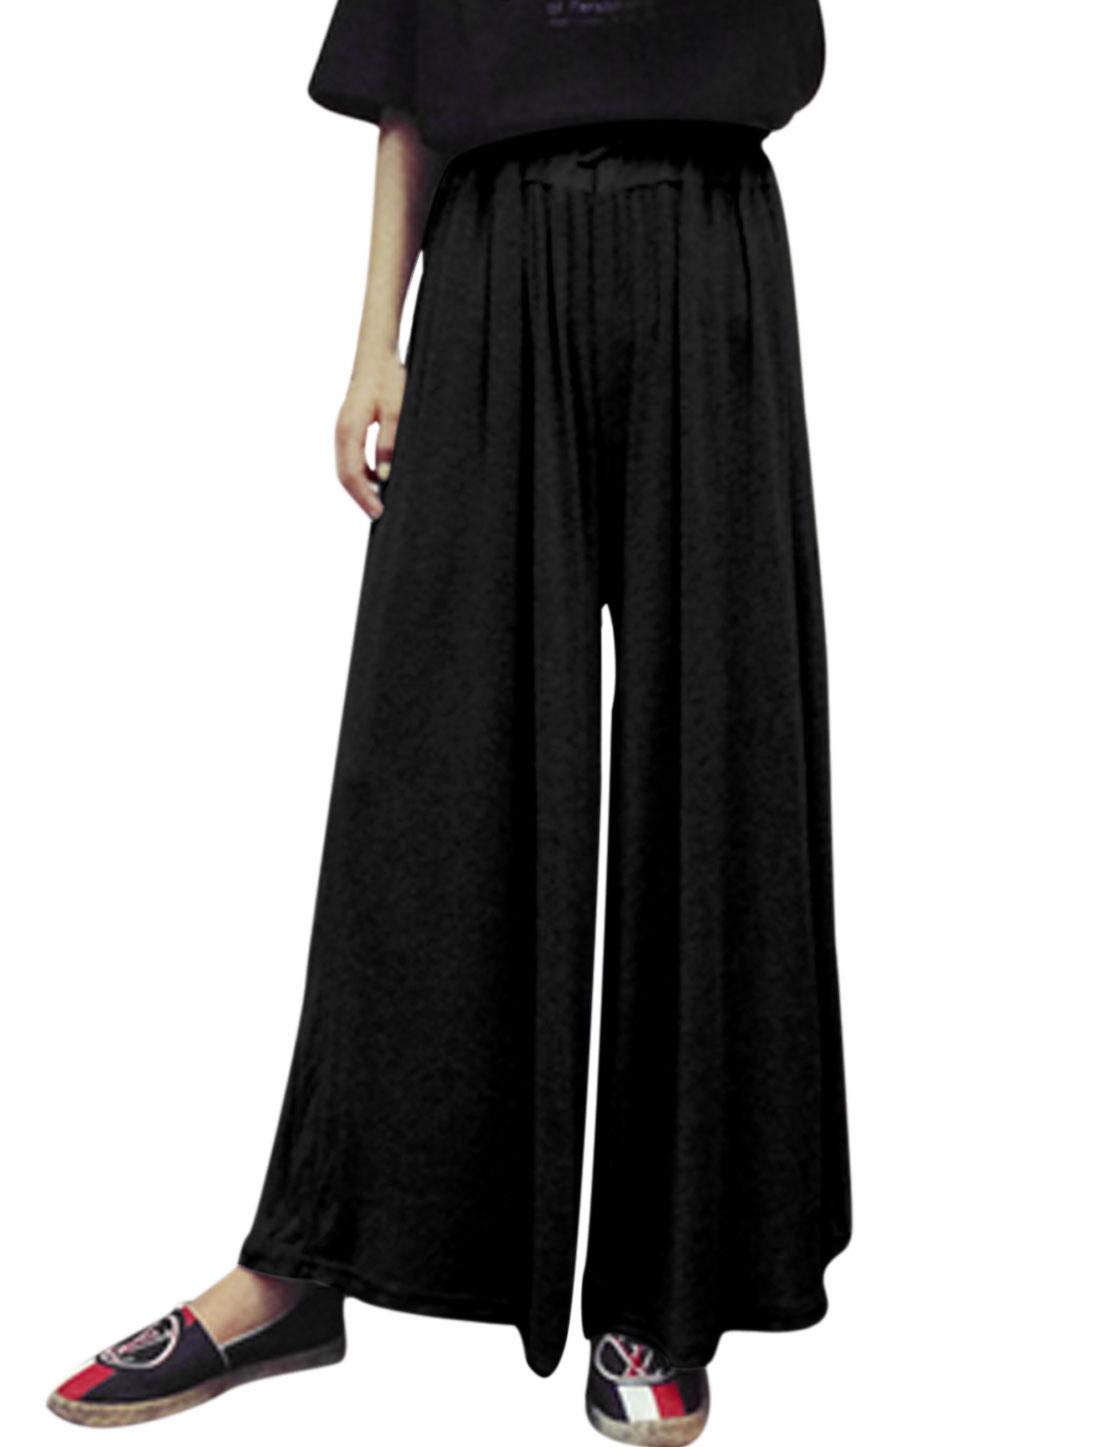 Woman Elastic Drawstring Waist Loose Fit Casual Palazzo Pants Black S